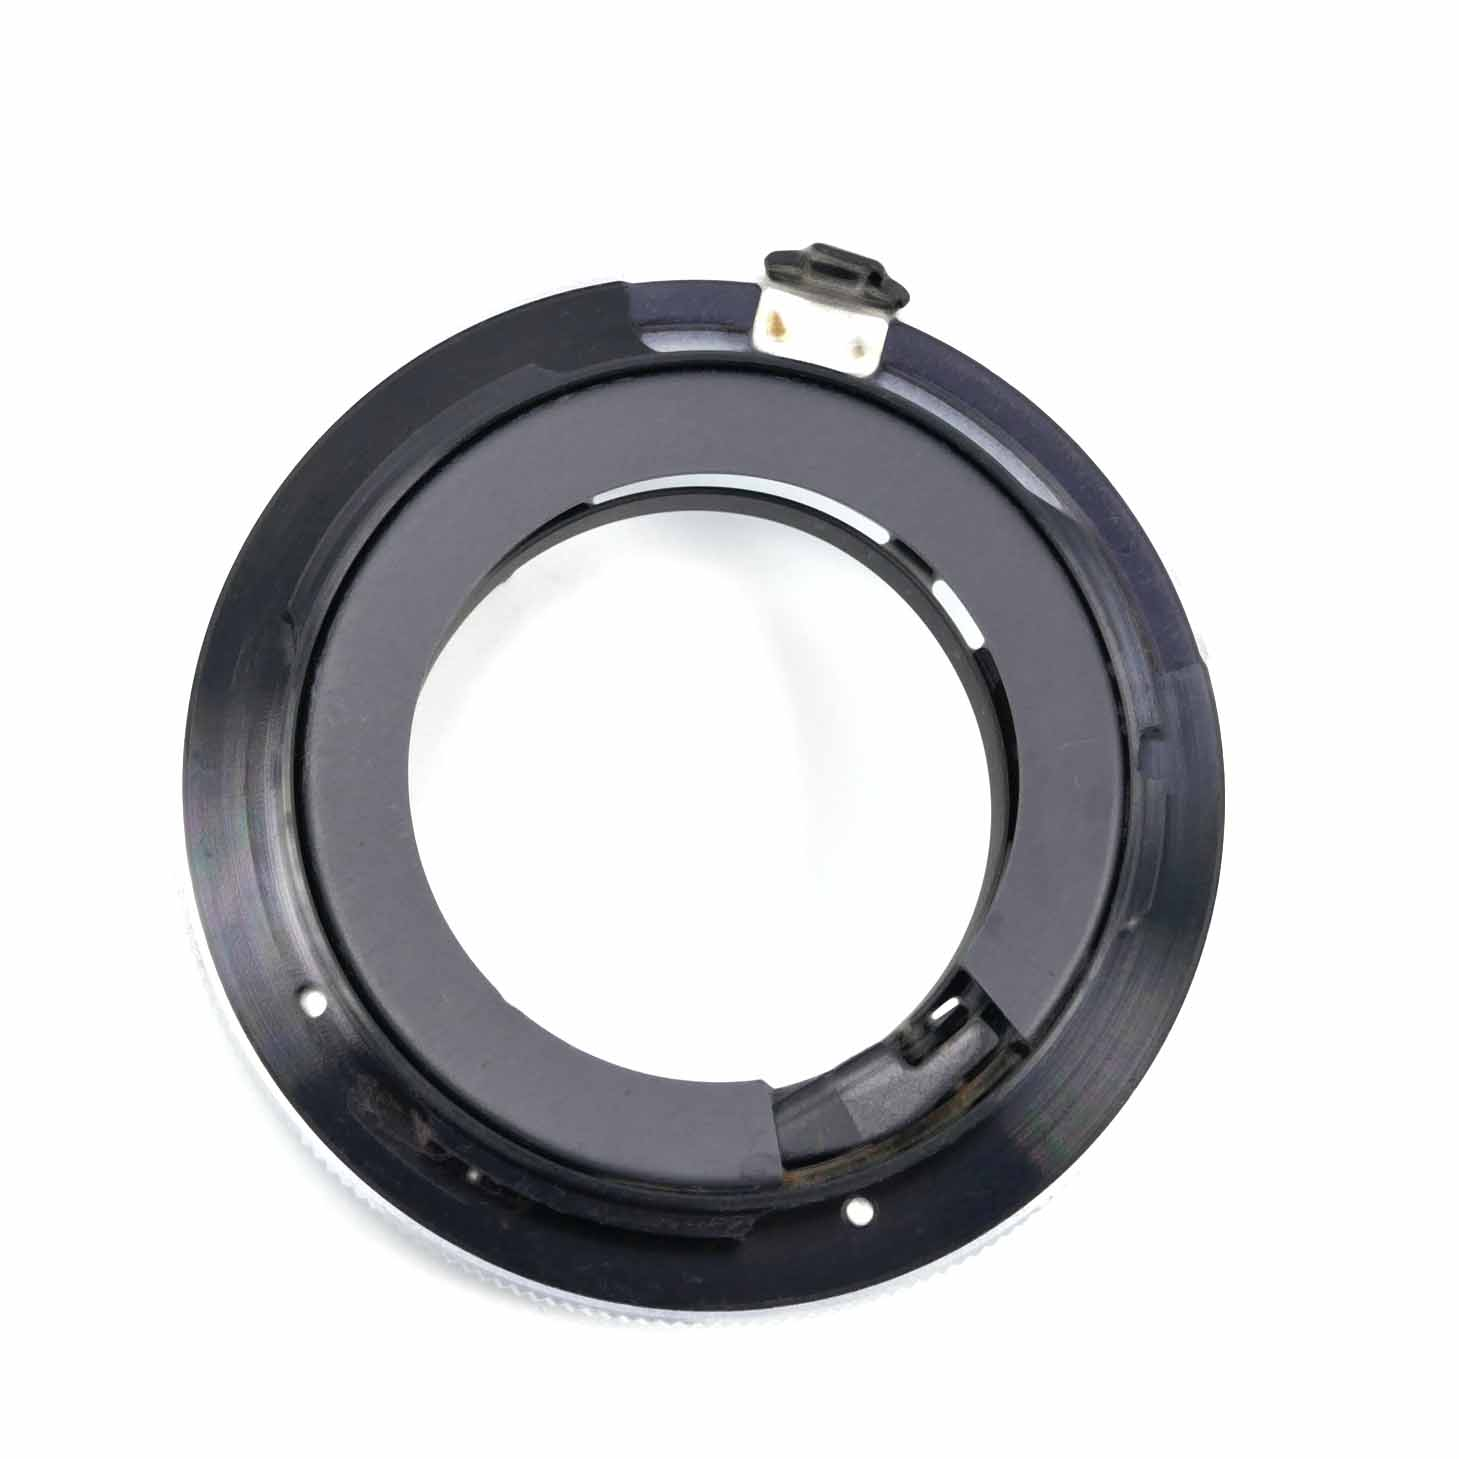 clean-cameras-Tamron-Adaptall-Contax-02